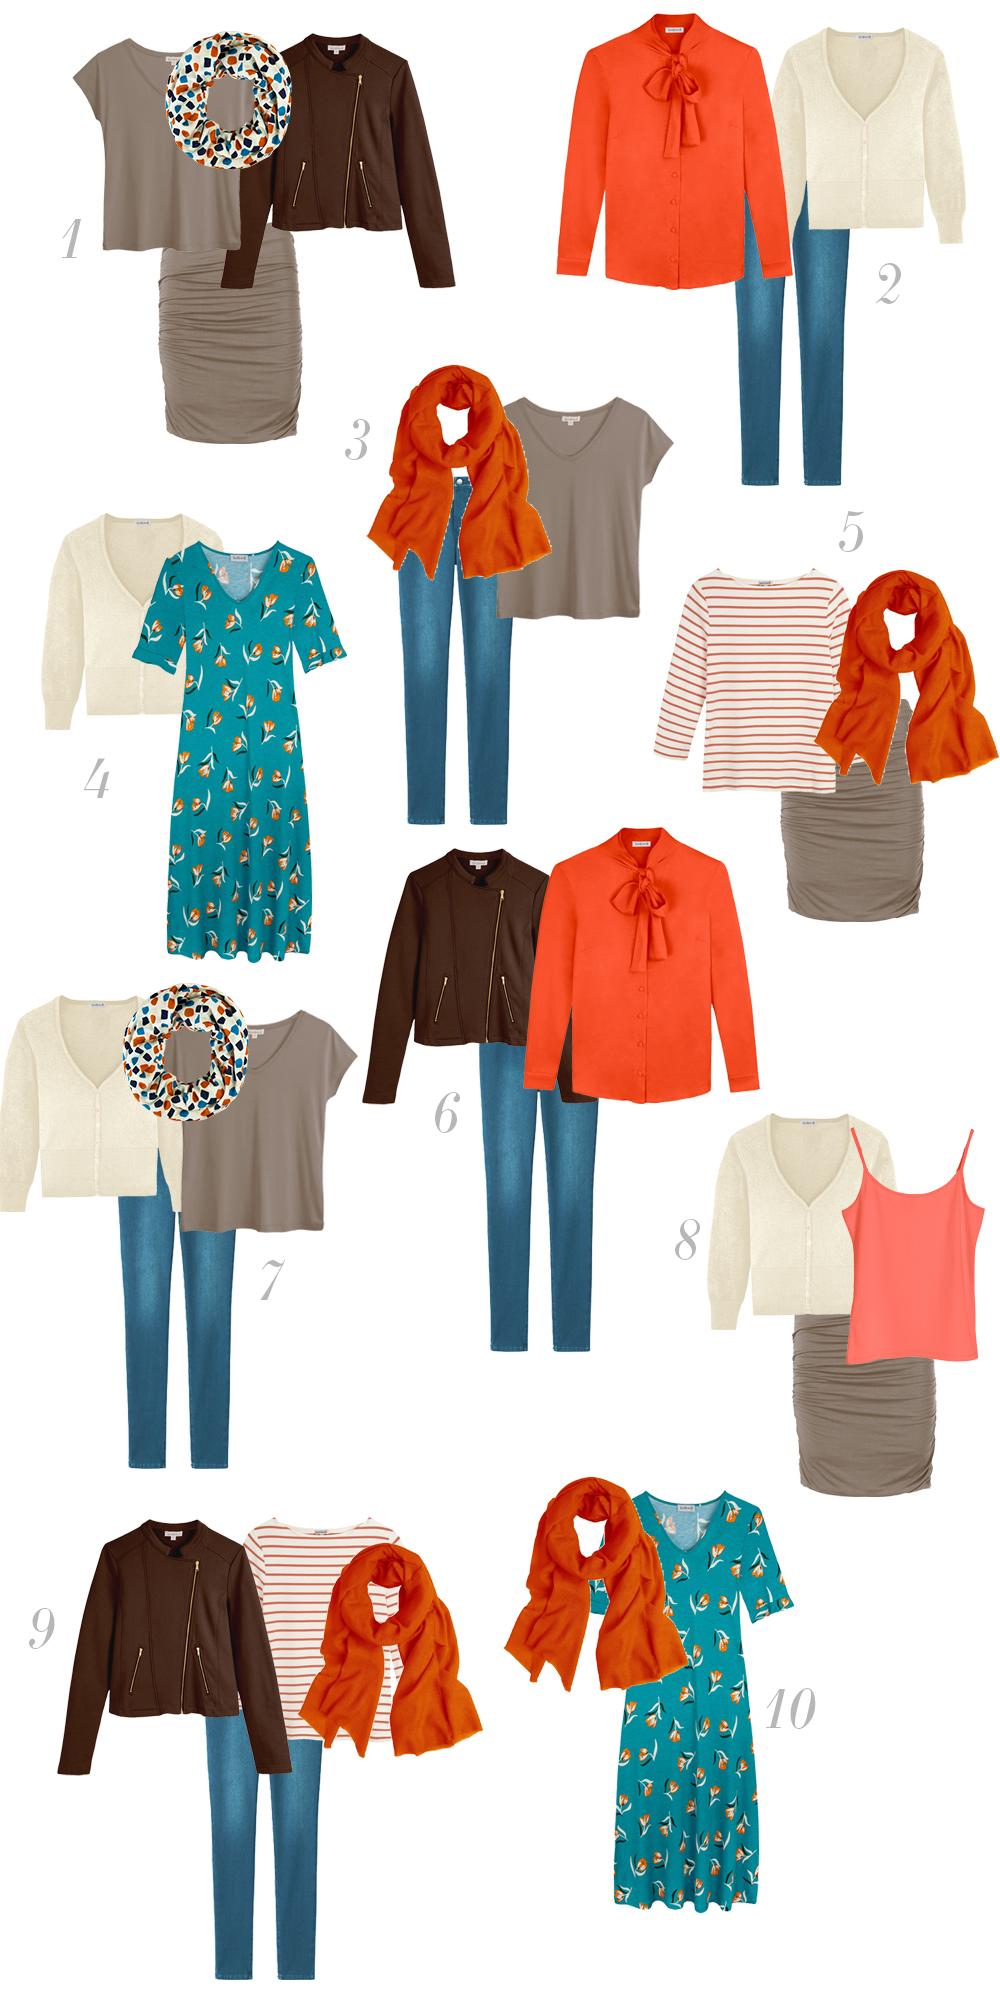 raw-autumn_outfits.jpg